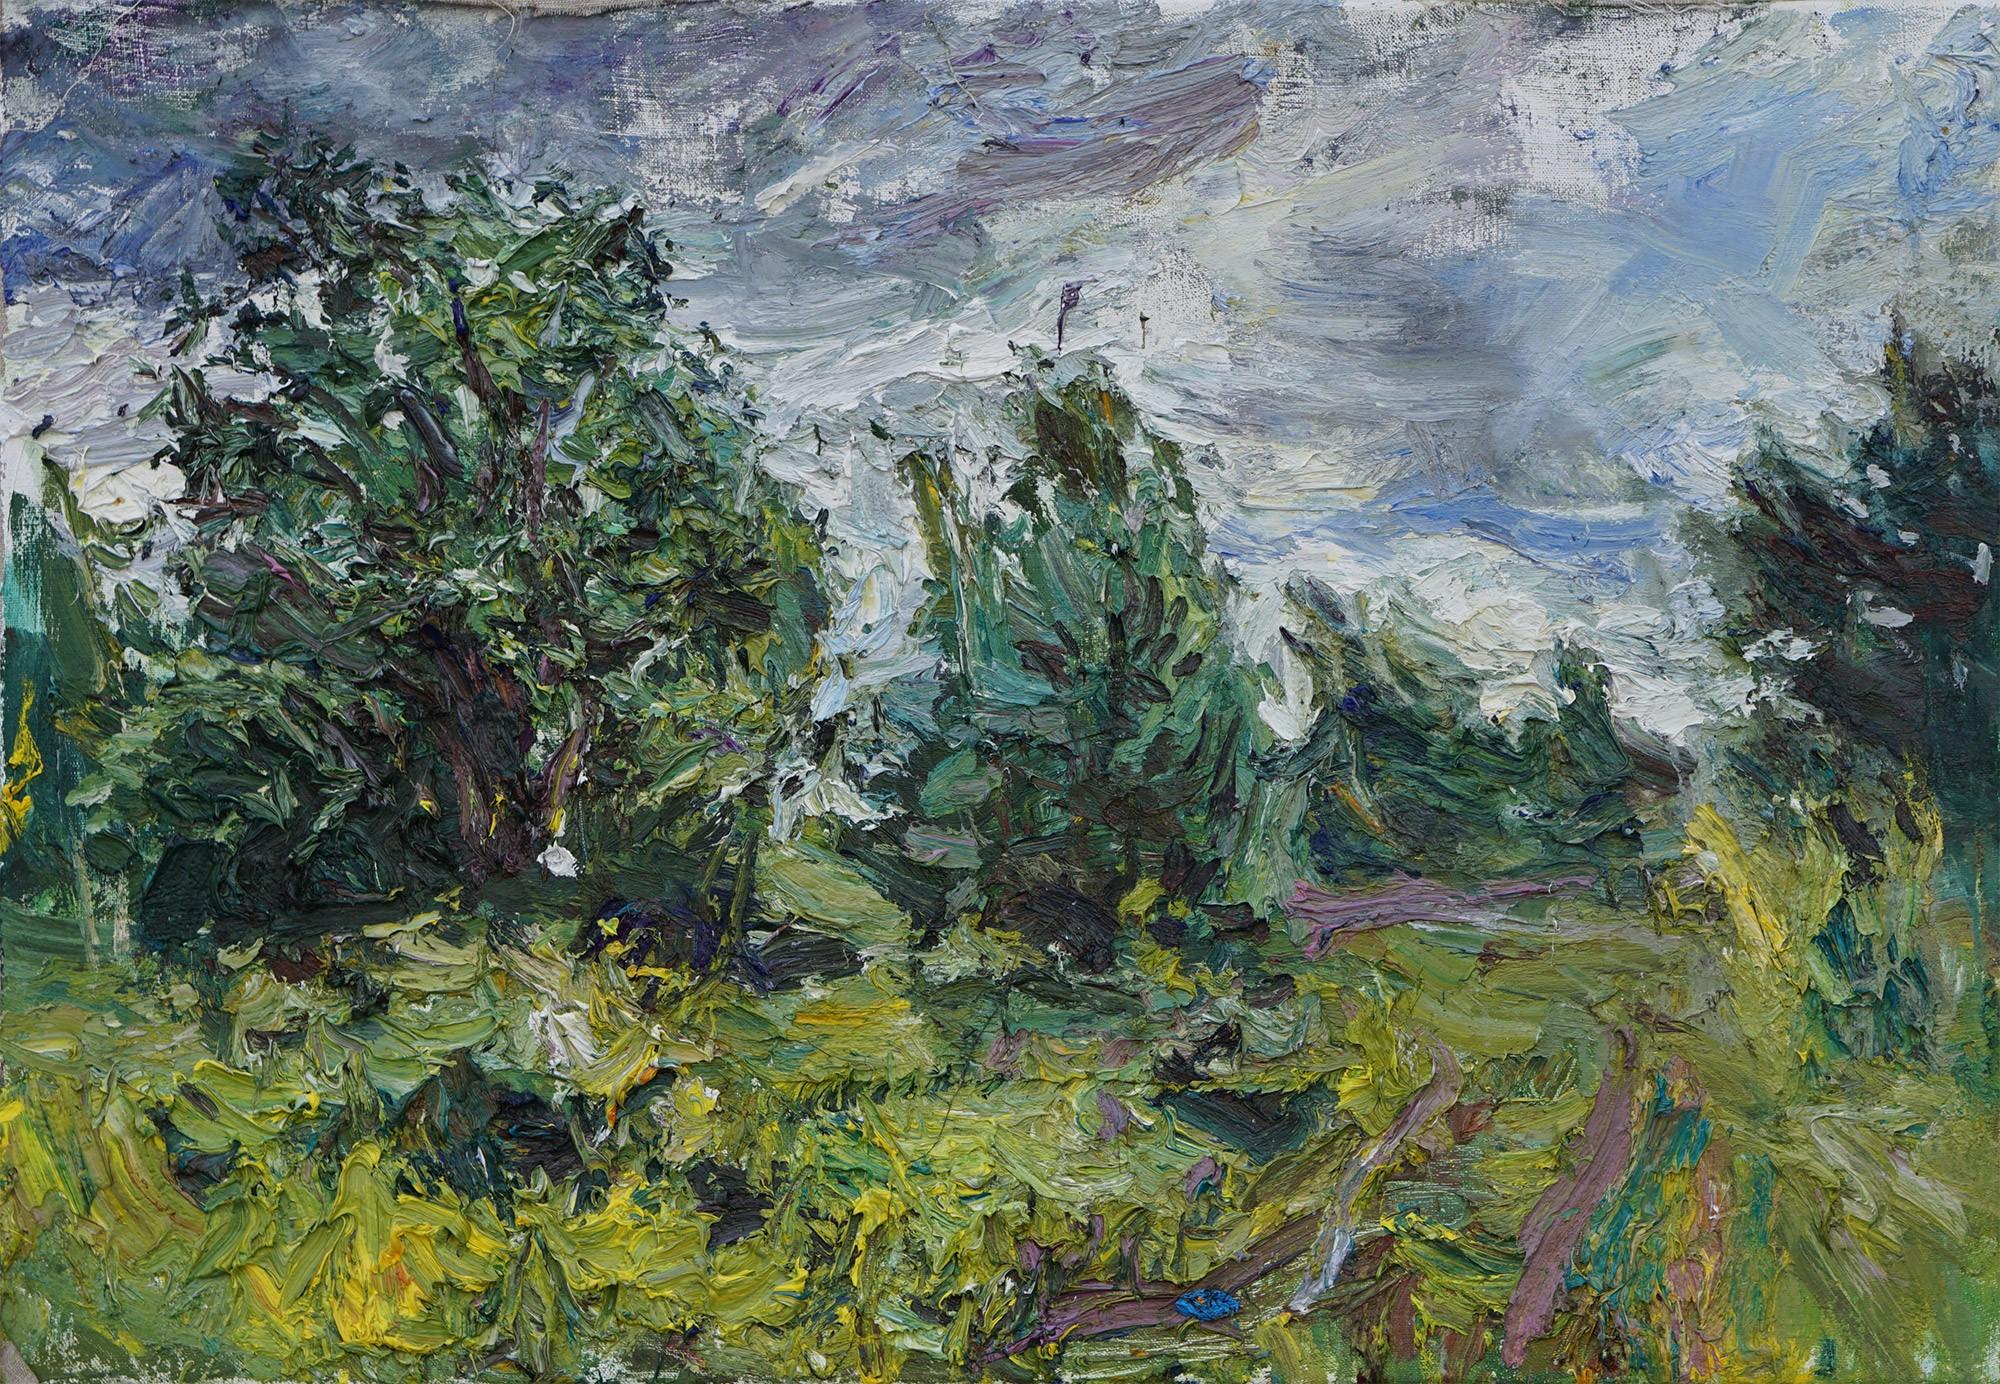 Stormy Day by Ulrich Gleiter